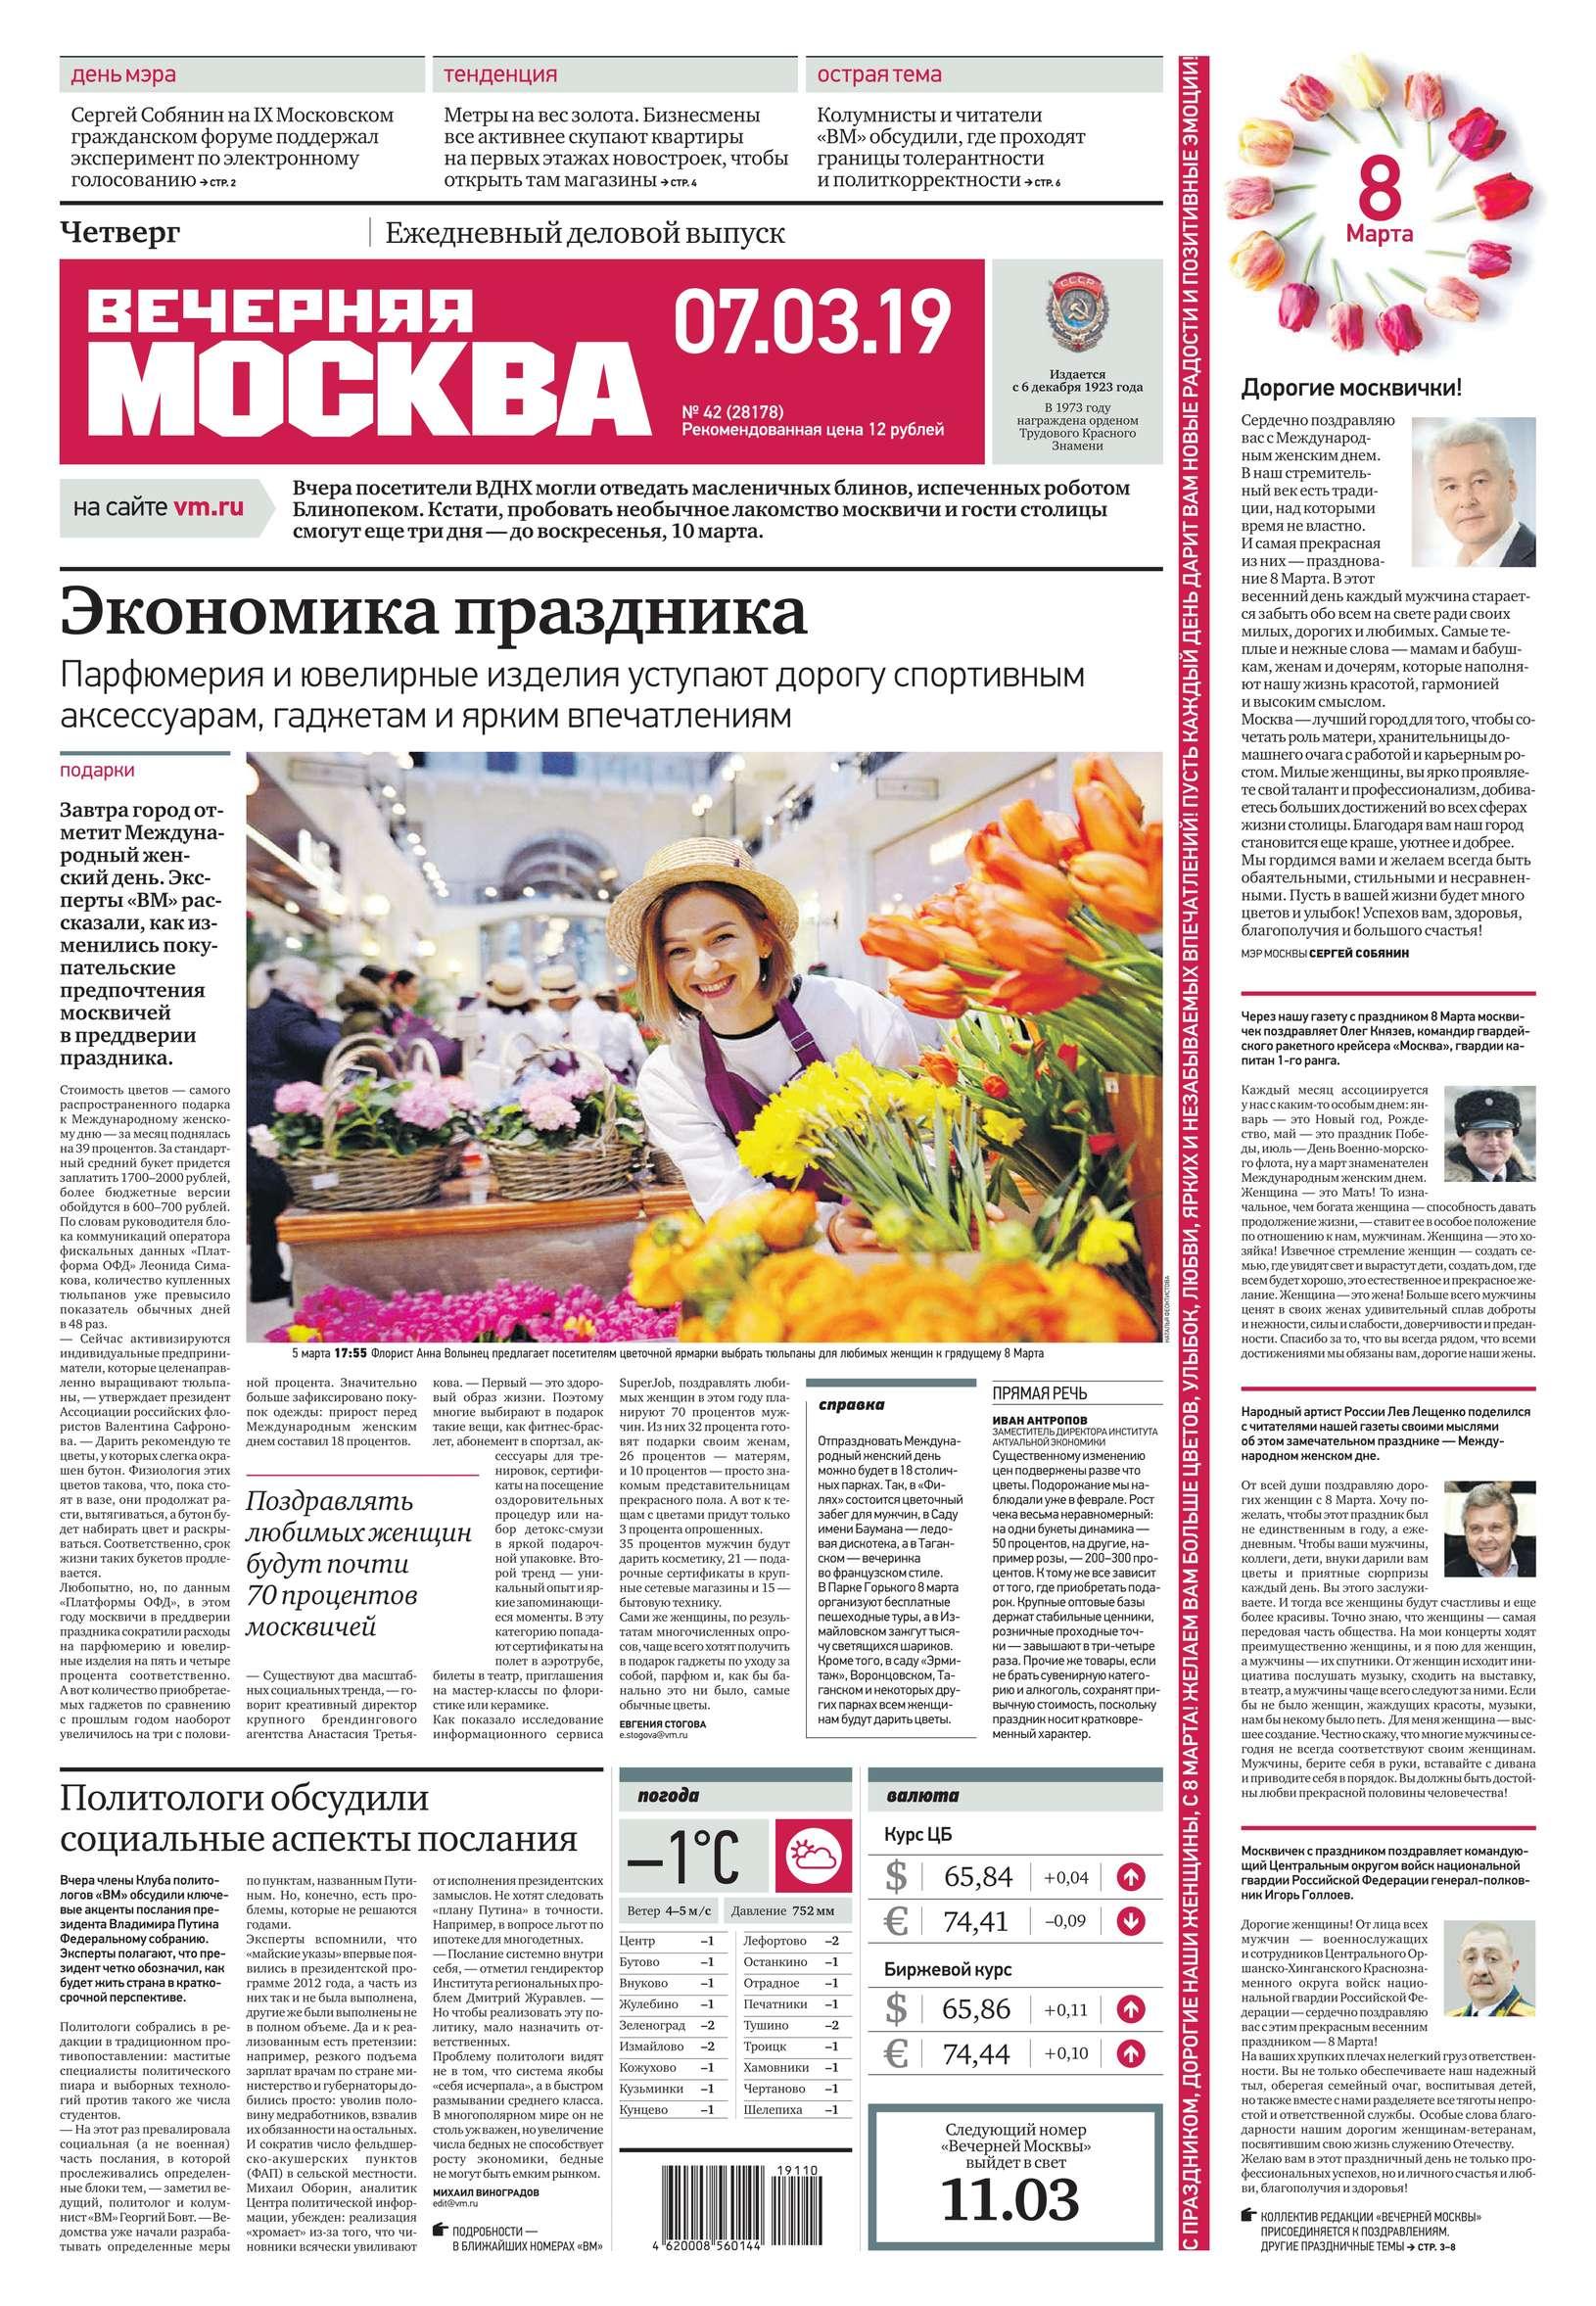 Редакция газеты Вечерняя Москва Вечерняя Москва 42-2019 вечерняя москва 2019 08 06t20 30